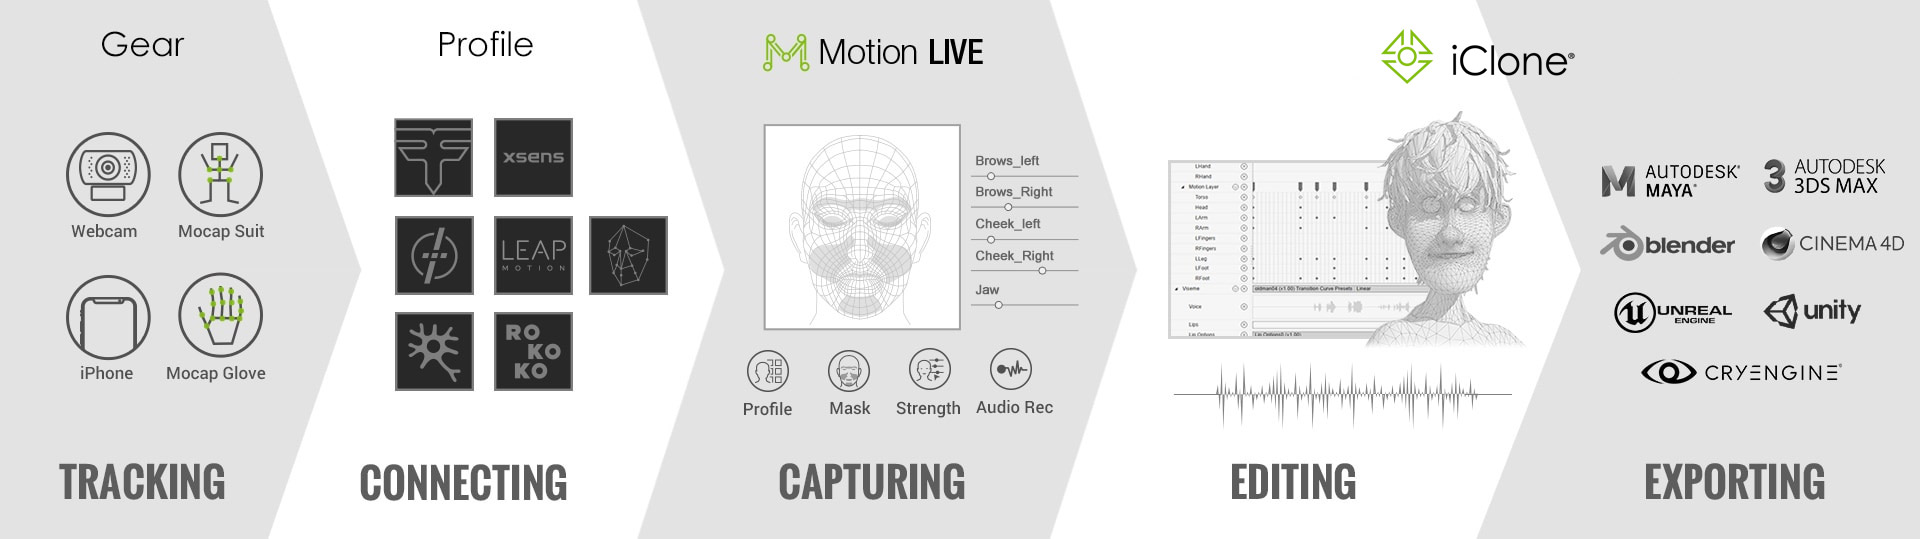 Full Body Motion Capture Animation Platform | Motion LIVE